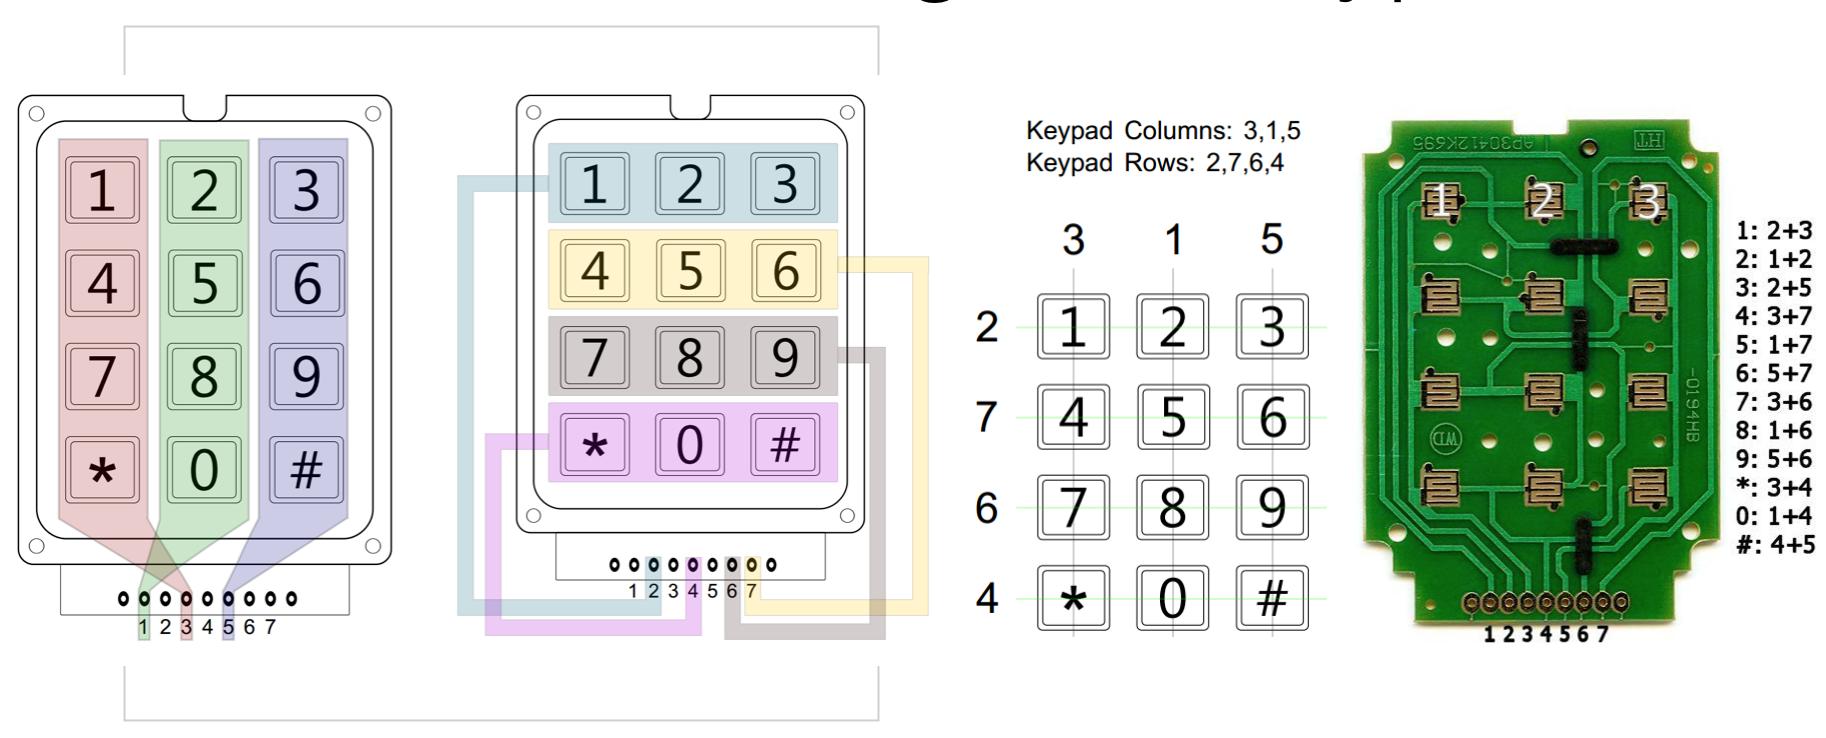 Understanding 4x3 keypad. Images from Sparkfun's Datasheet.